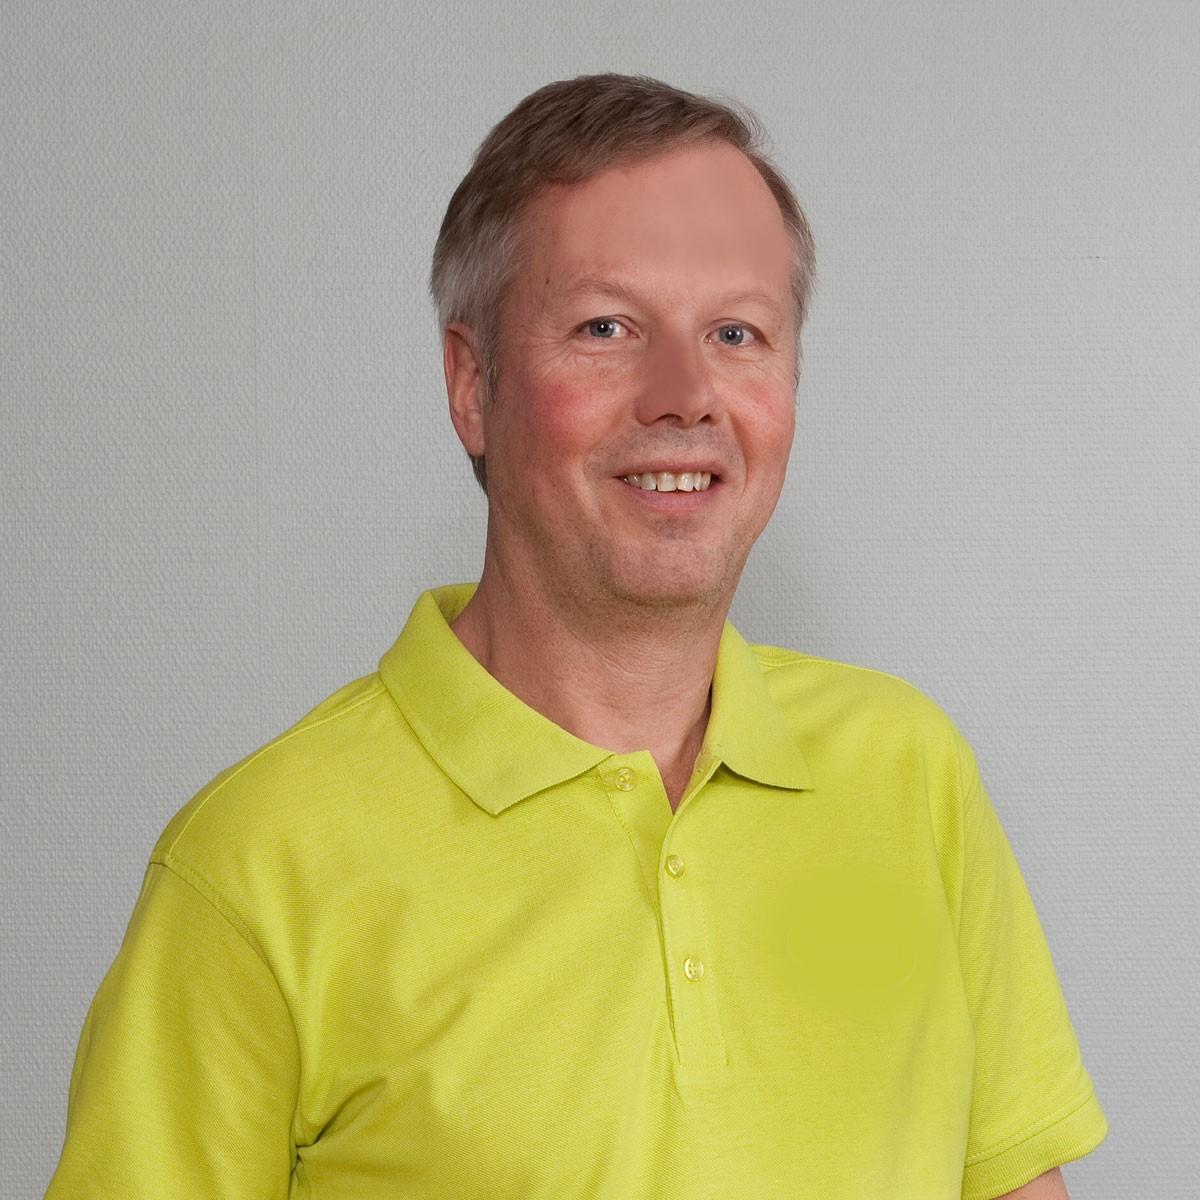 Kurt Persson